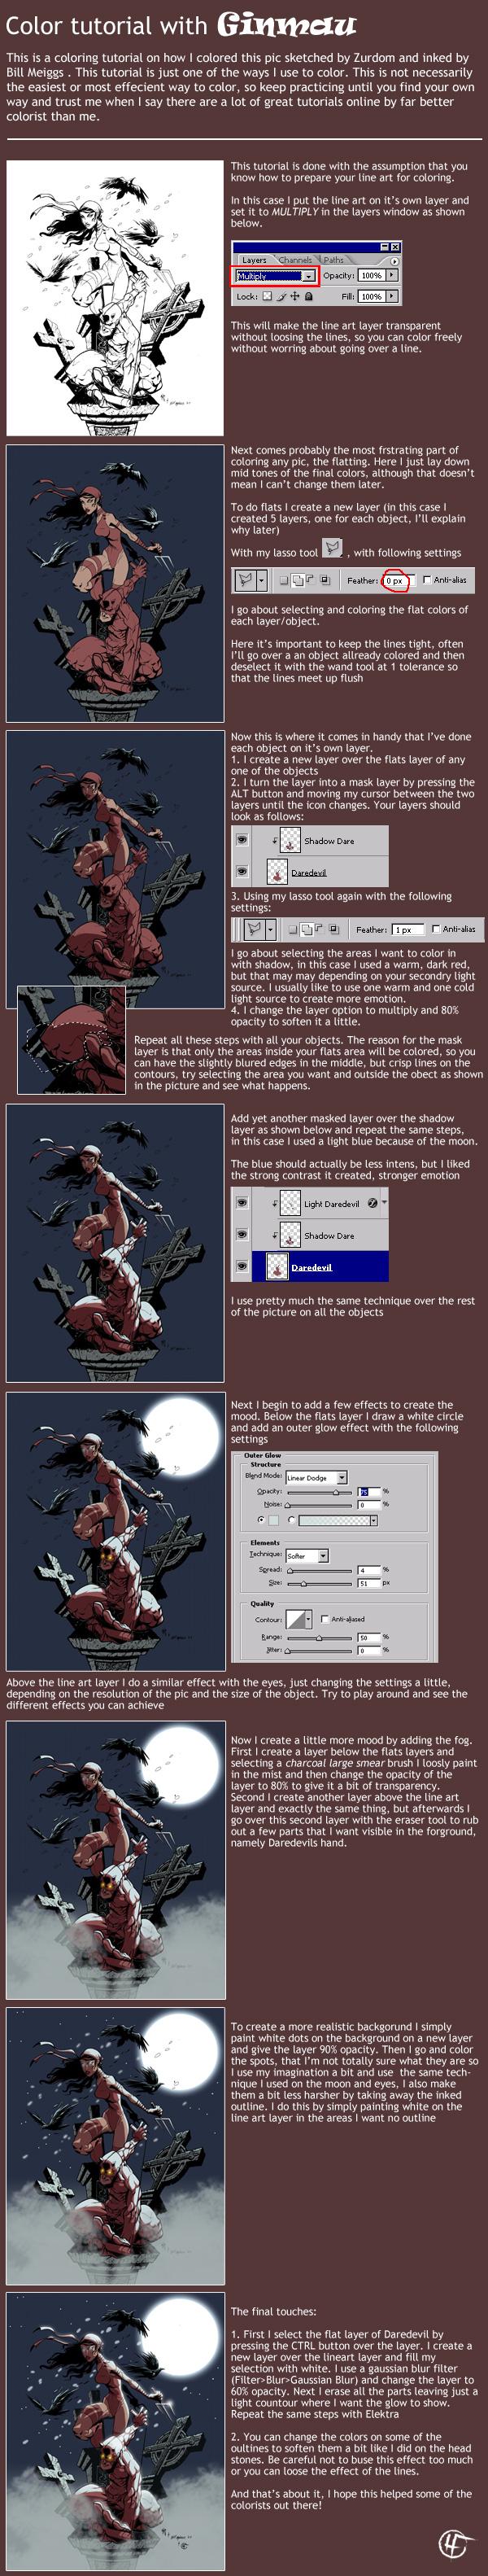 How To Color And Highlight A Comic Book Panel In Photoshop Pintura Digital Tutoriais Inspirador